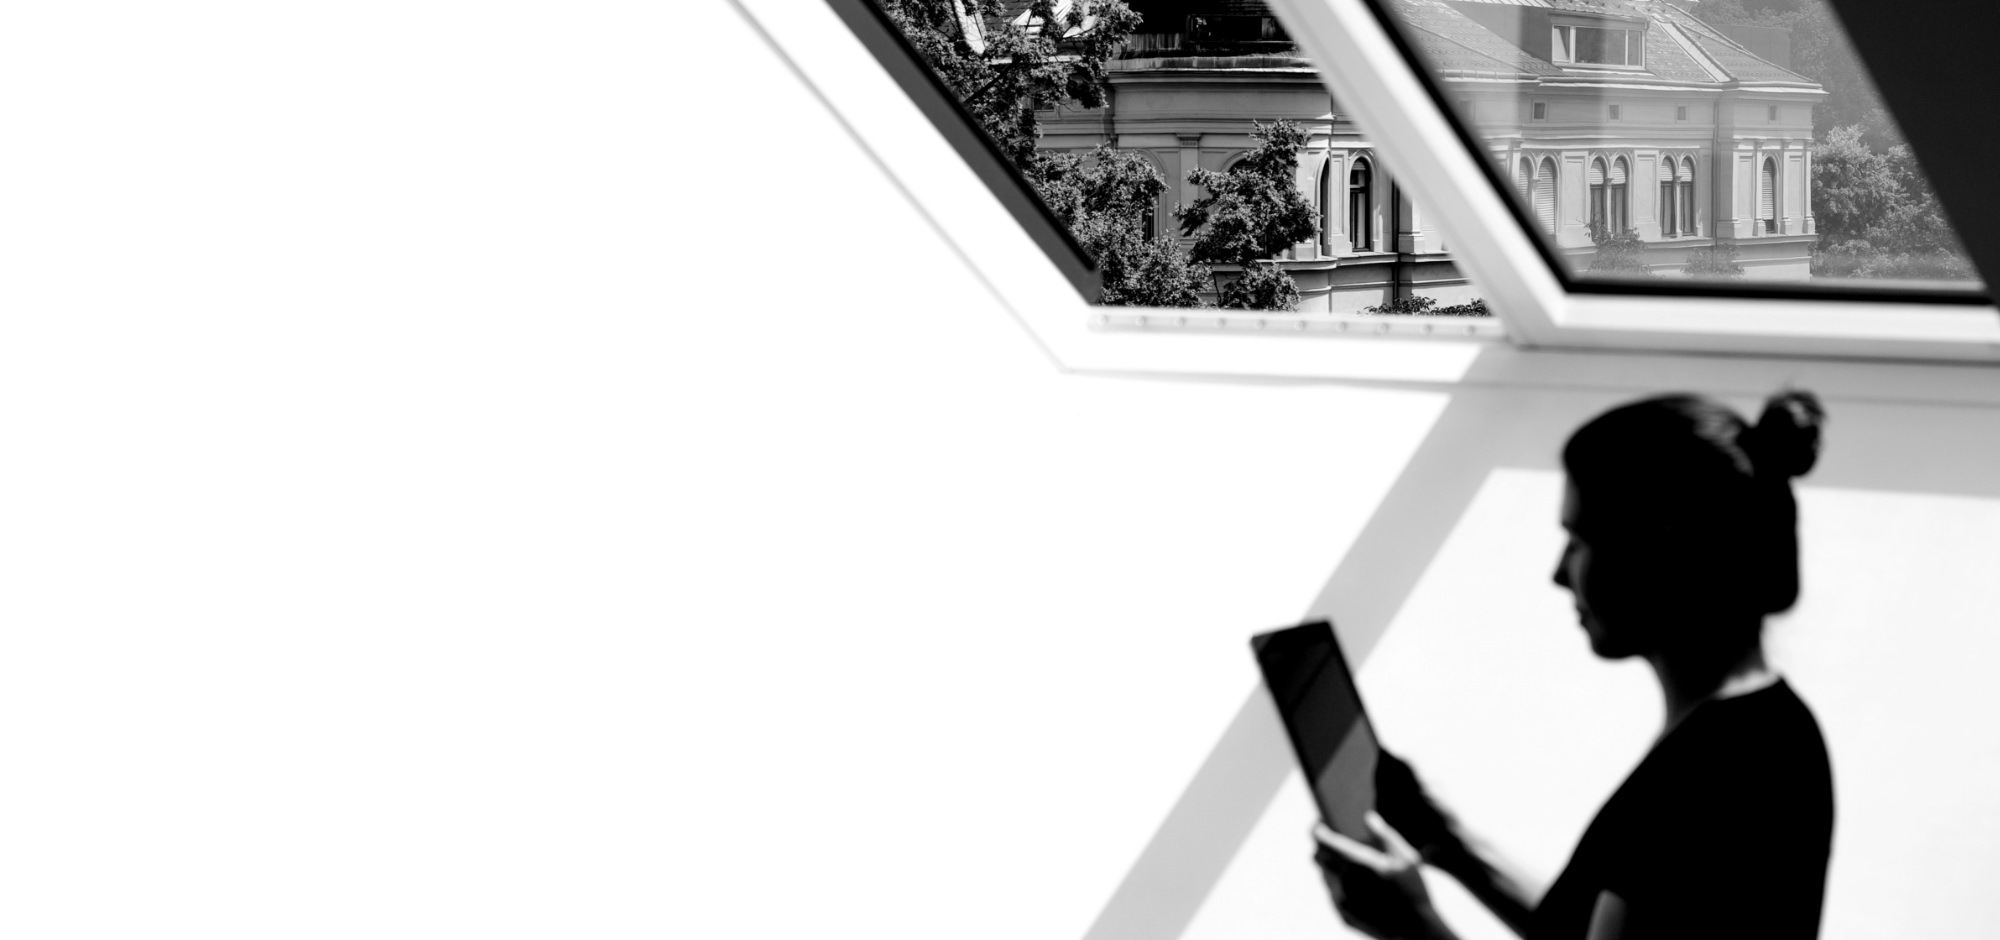 Frau am Tablet unter Dachfenster in Graz